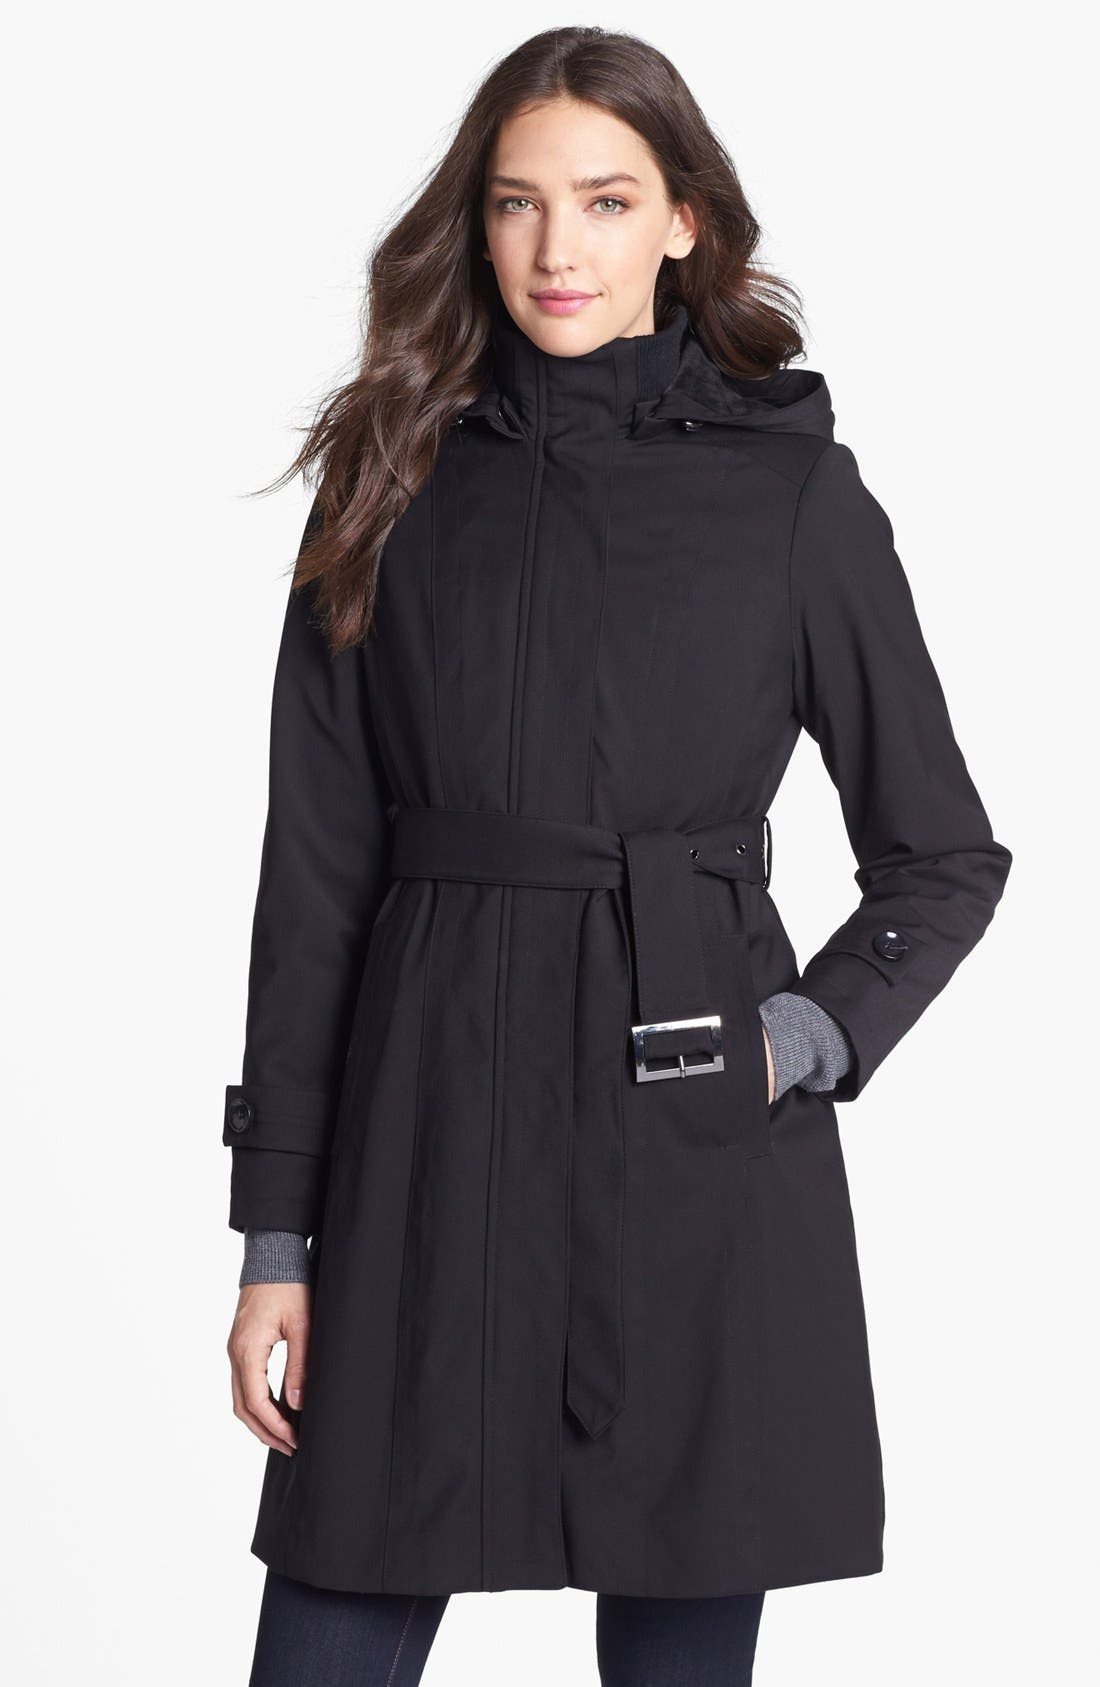 Alternate Image 1 Selected - Kristen Blake Raincoat with Detachable Hood & Liner (Petite) (Nordstrom Exclusive)